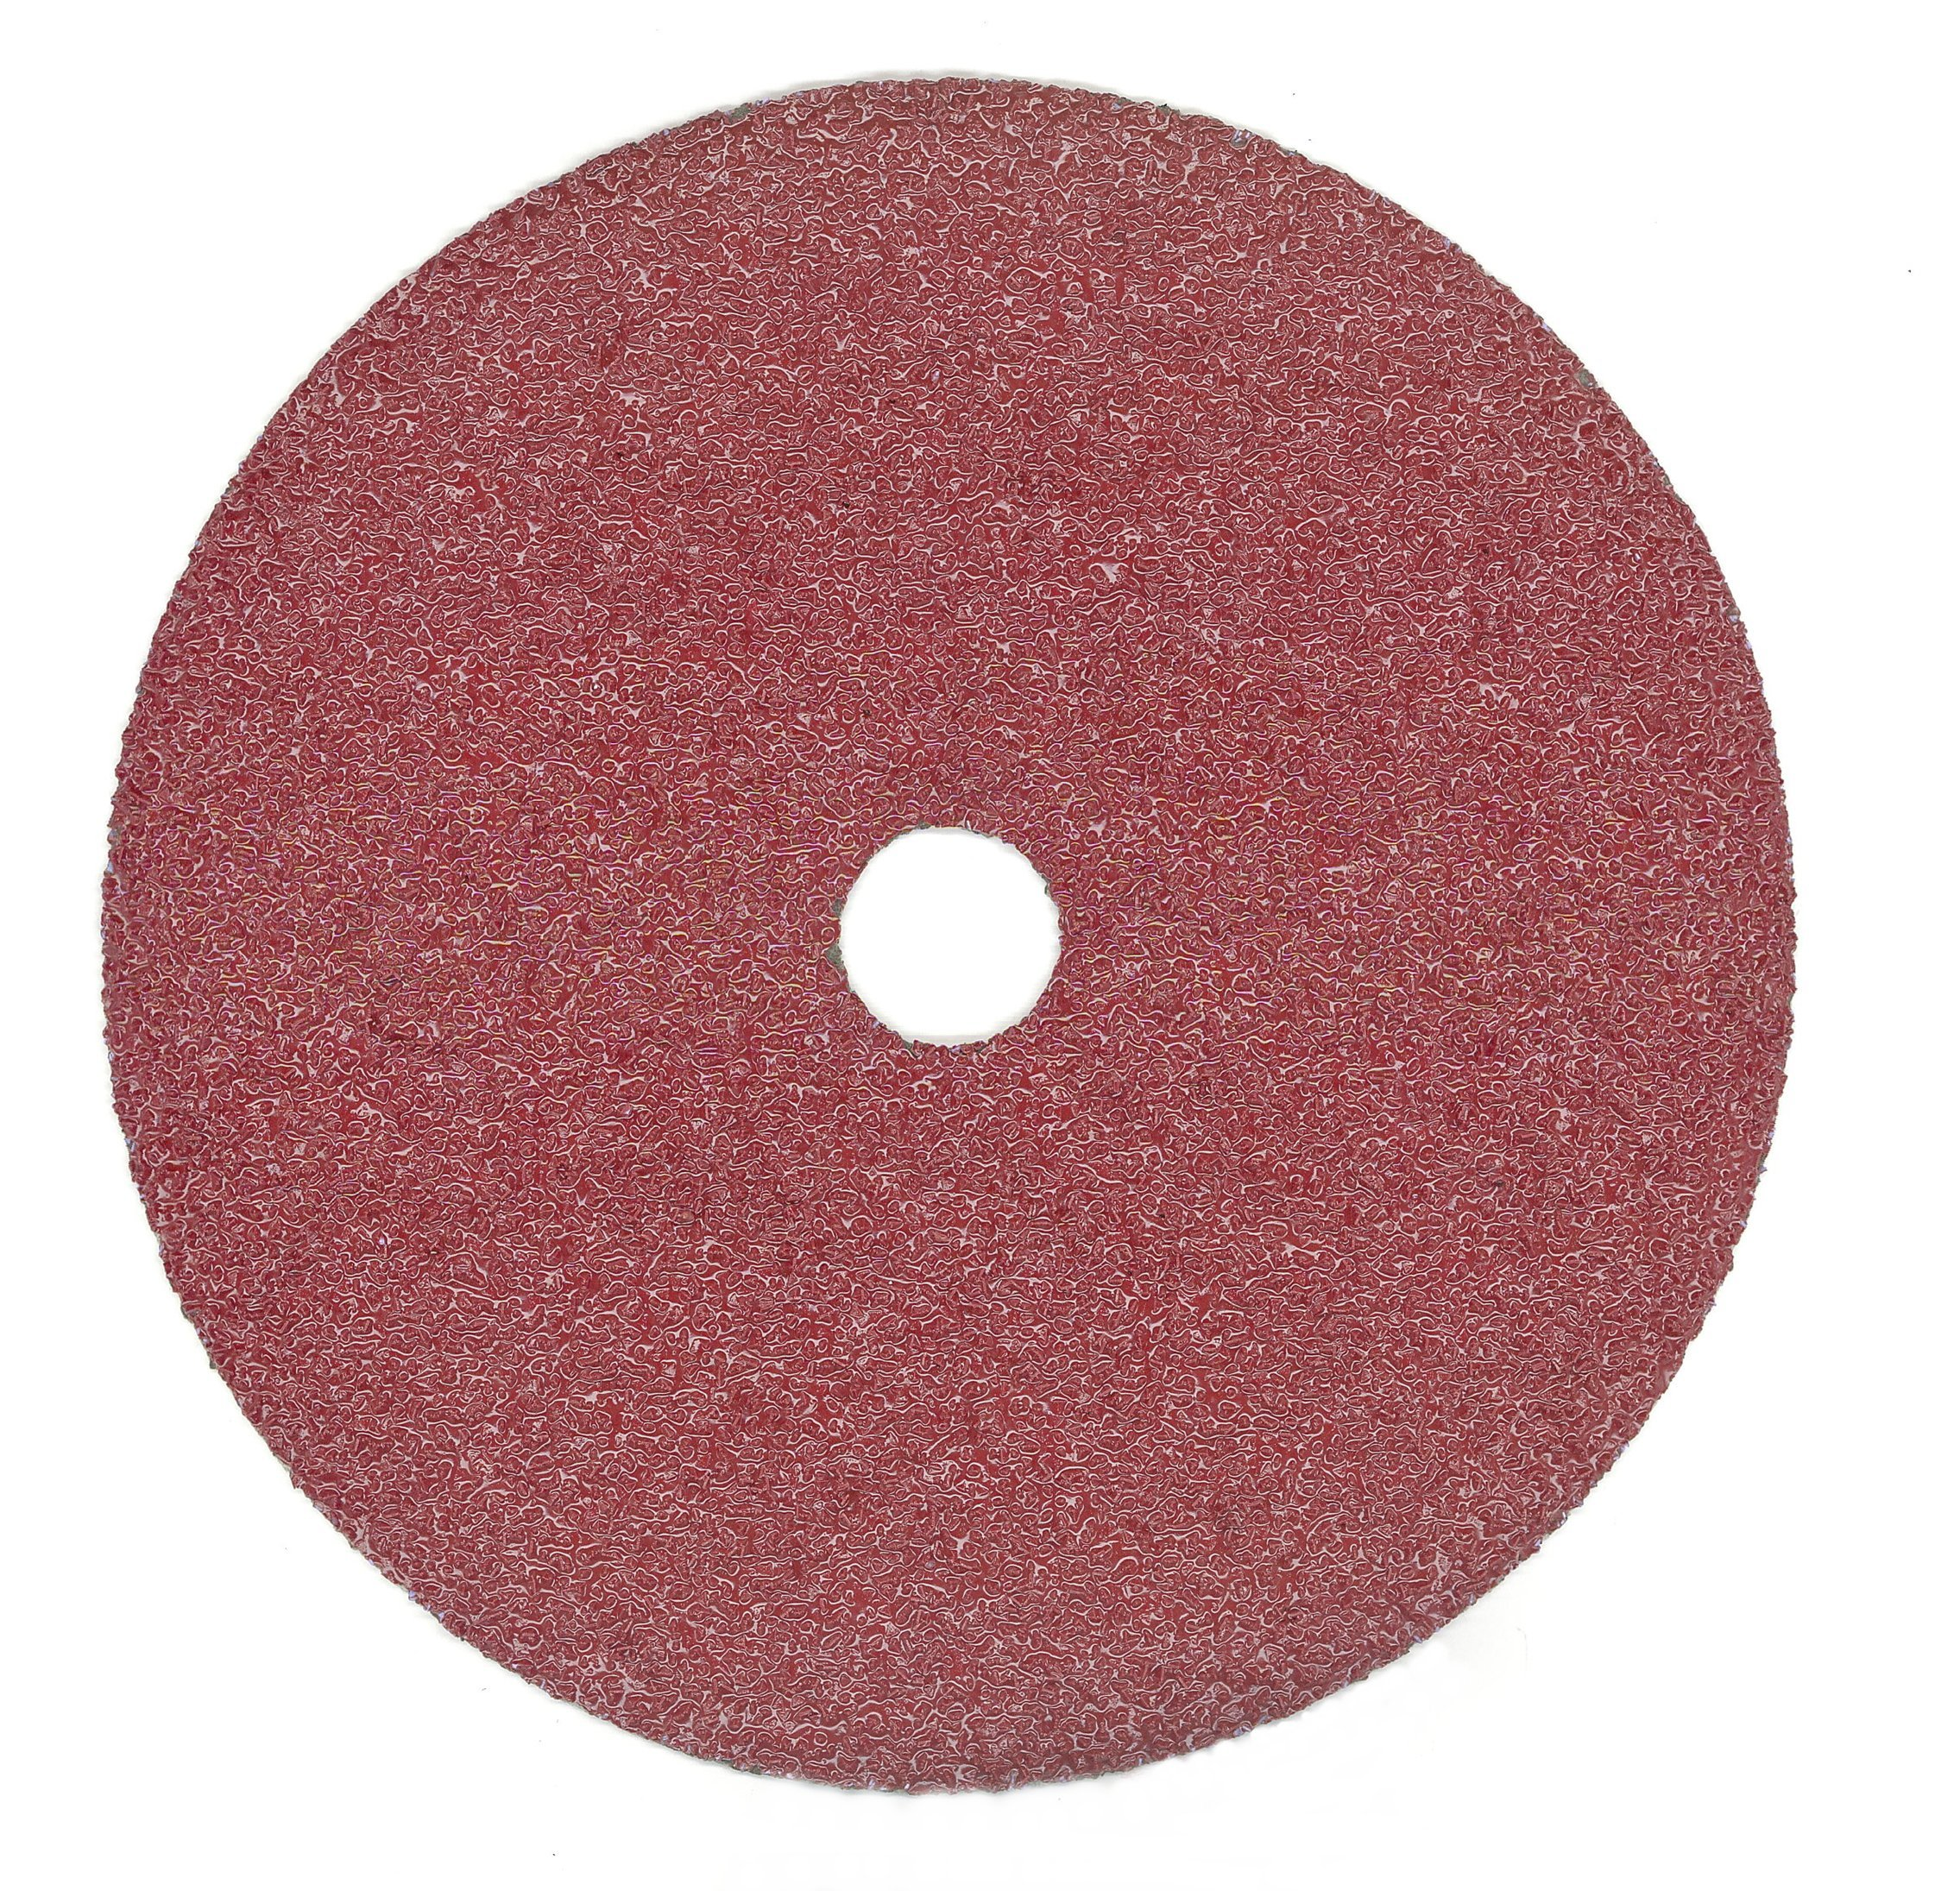 3M Cubitron II Fibre Disc 982C, Precision Shaped Ceramic Grain, 4-1/2'' Diameter, 36+ Grit, Brown  (Pack of 100)